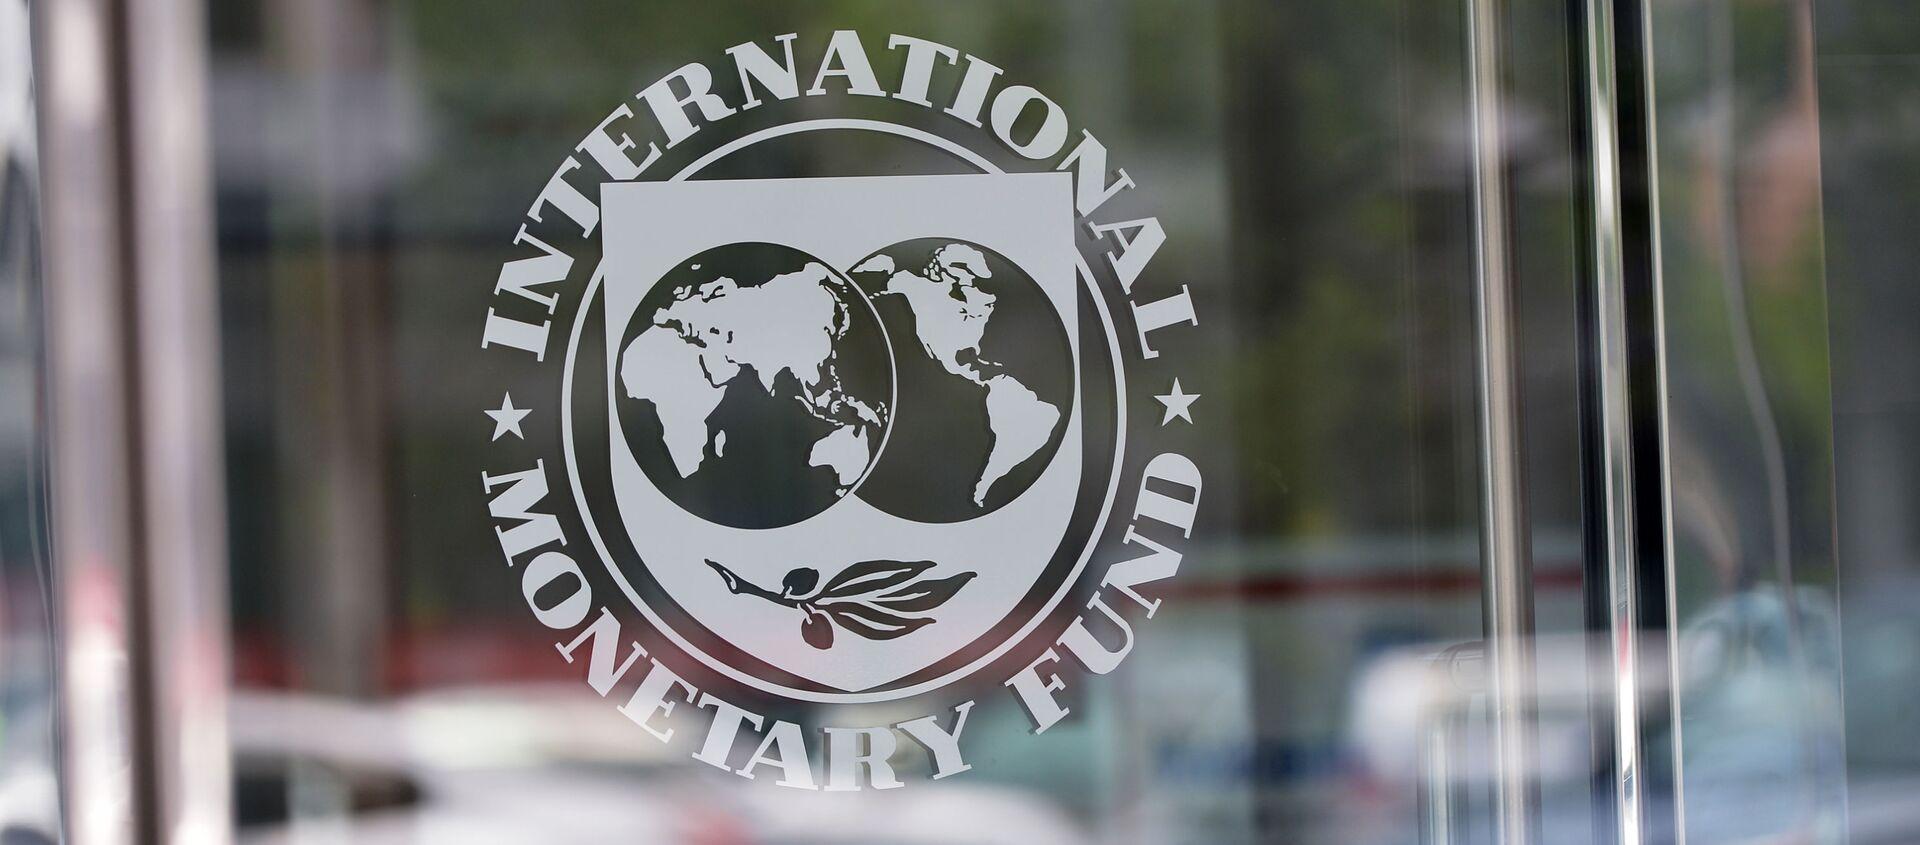 La sede dell'Fmi a Washington - Sputnik Italia, 1920, 16.07.2020